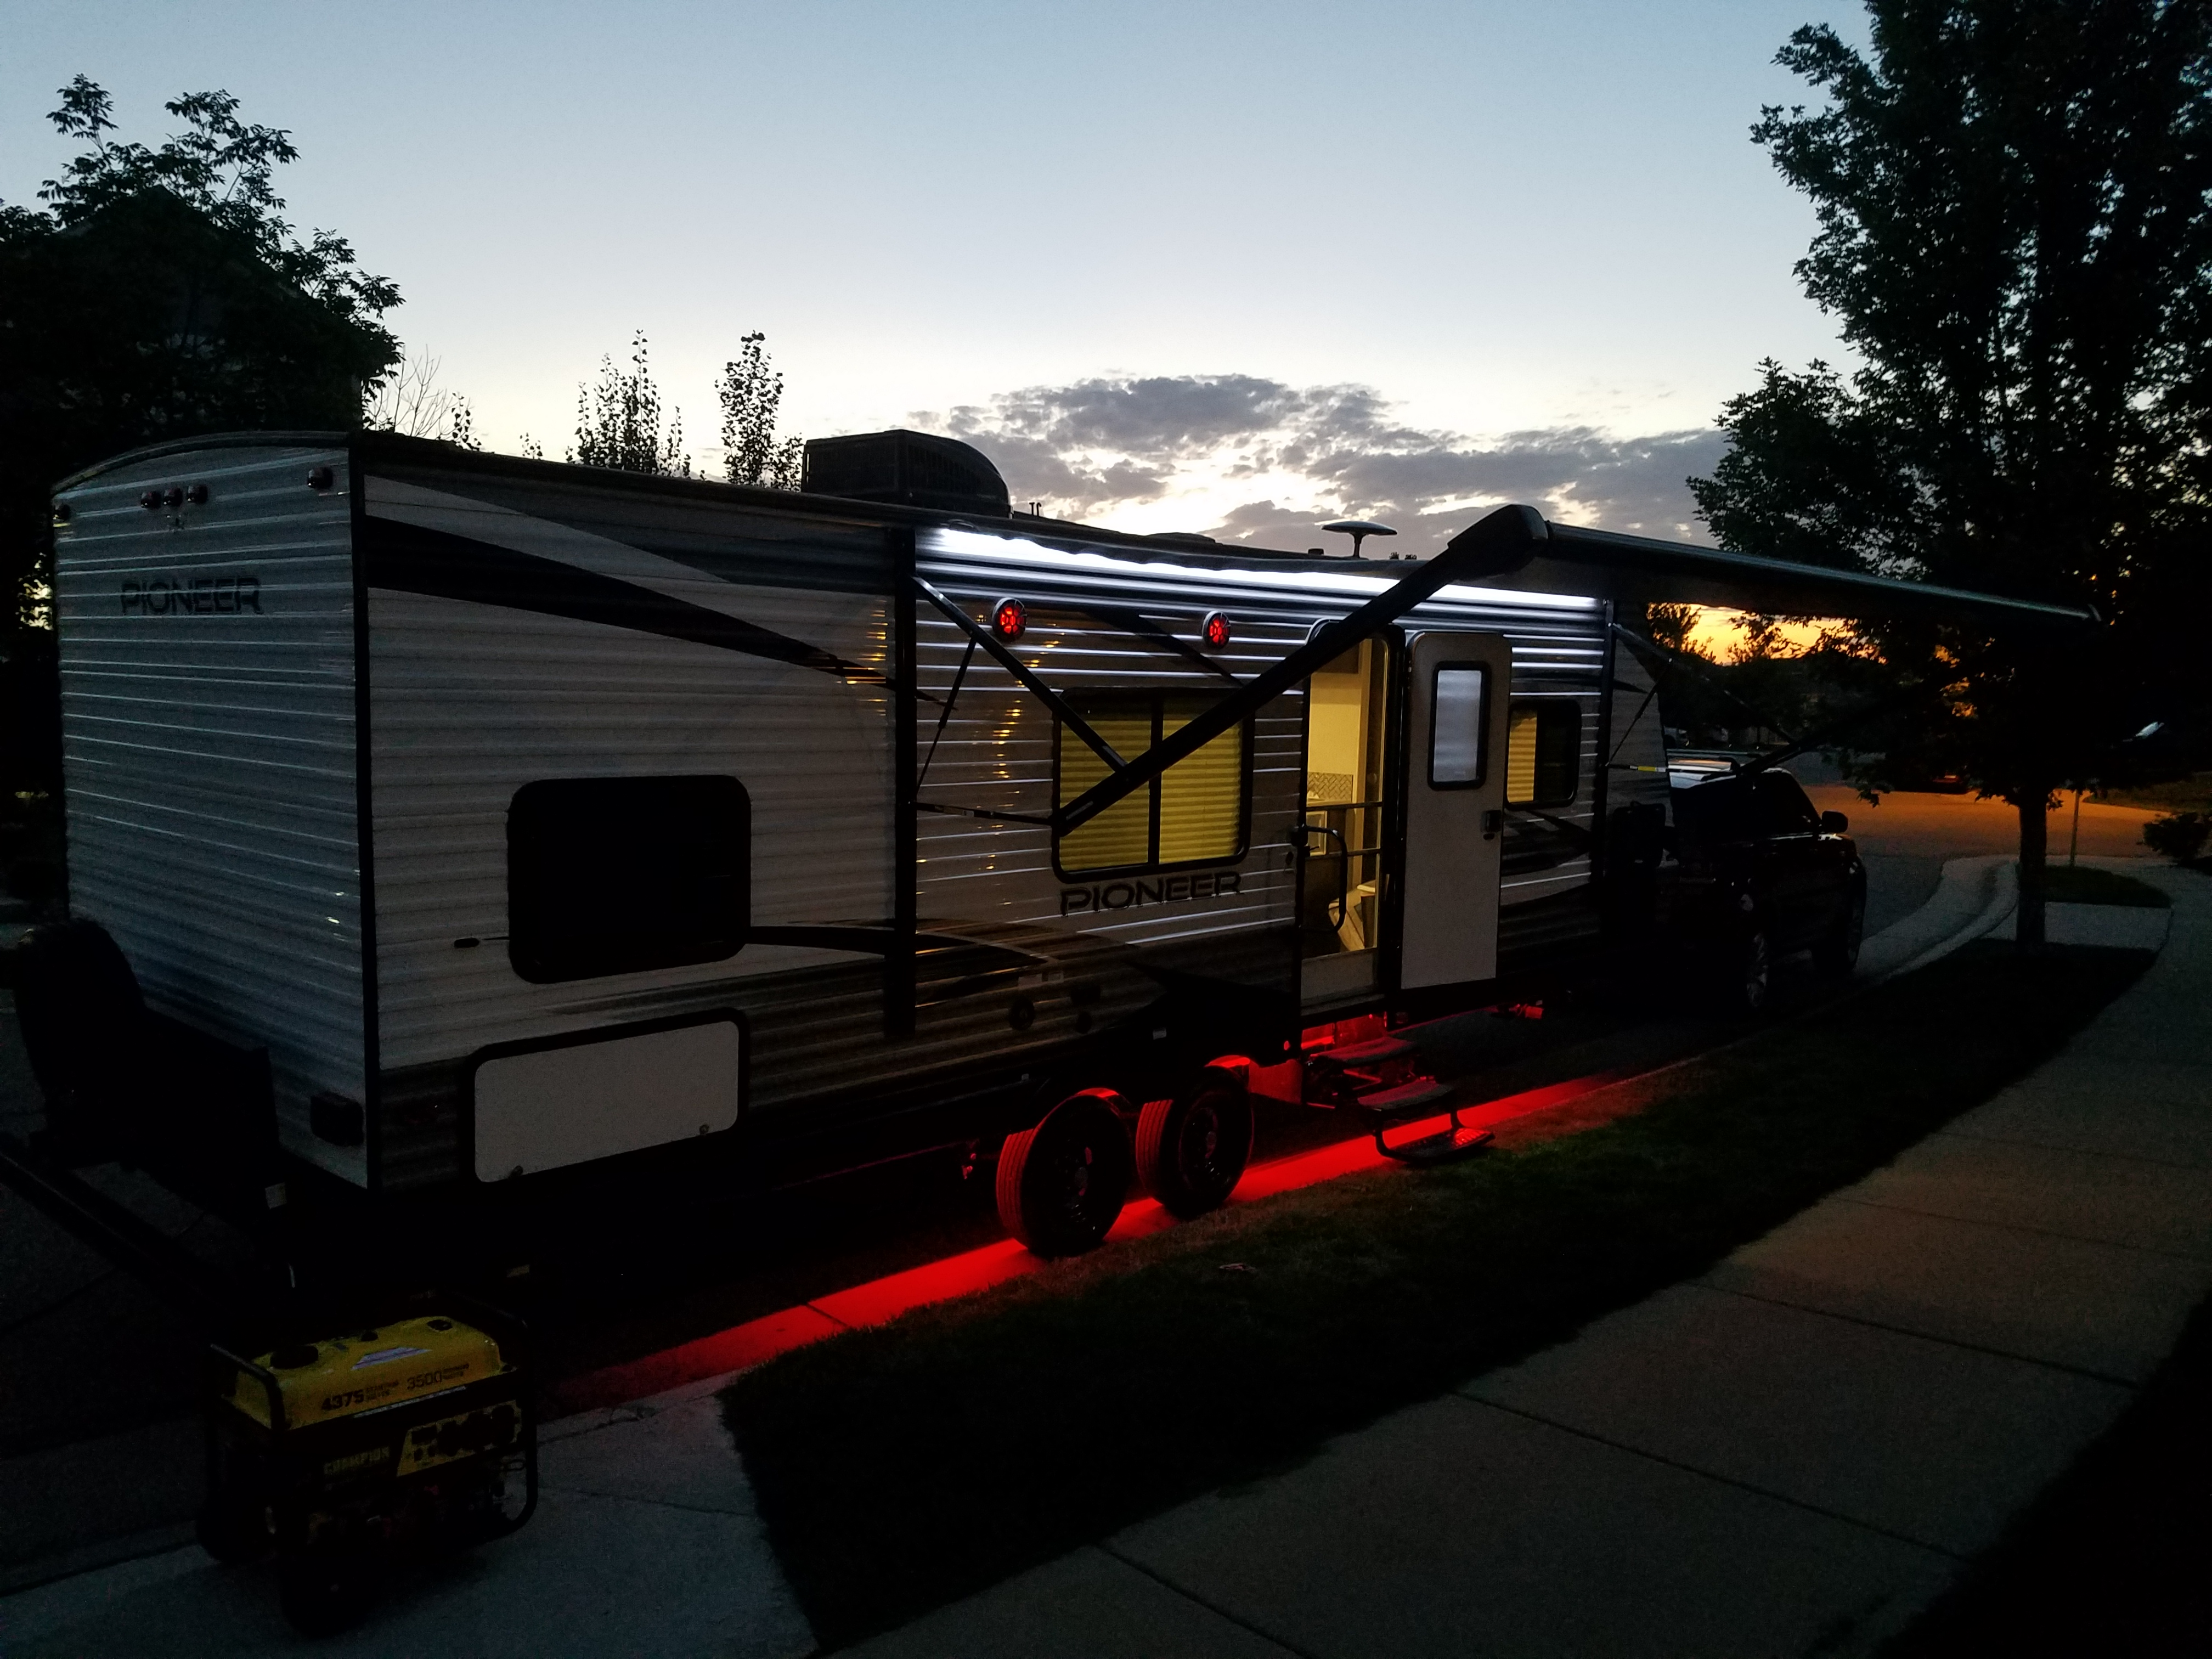 Exterior at night. Heartland Pioneer 2019